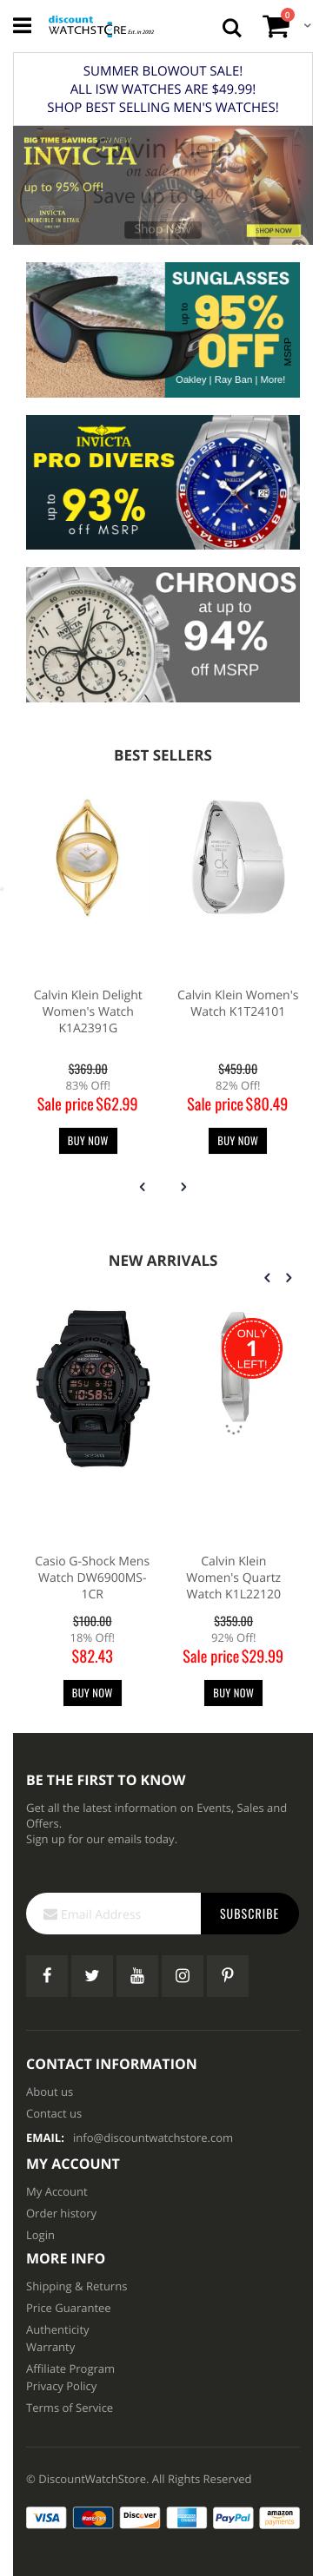 DiscountWatchStore.com Coupon